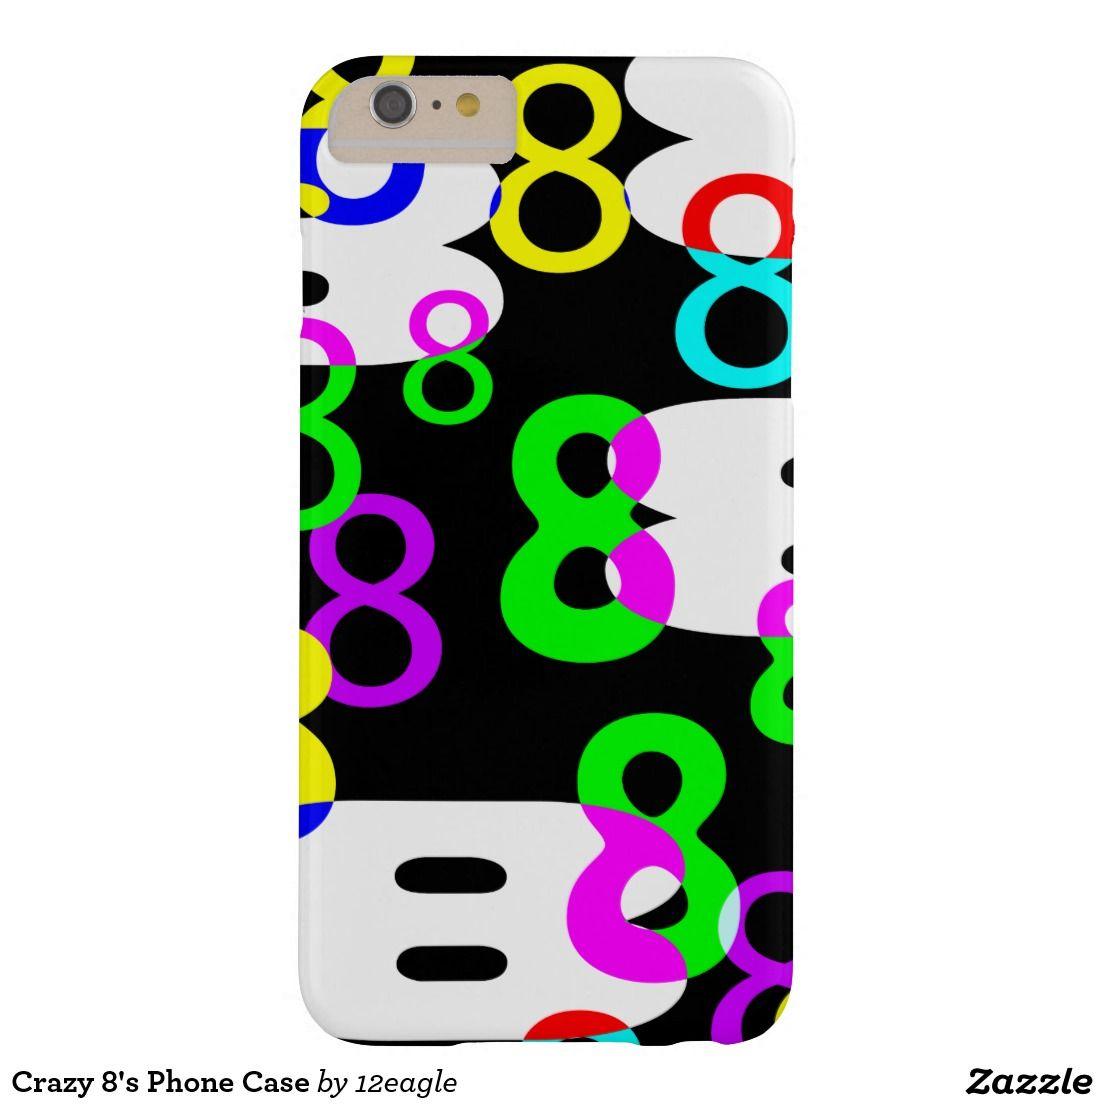 Crazy 8s phone case crazy iphone case